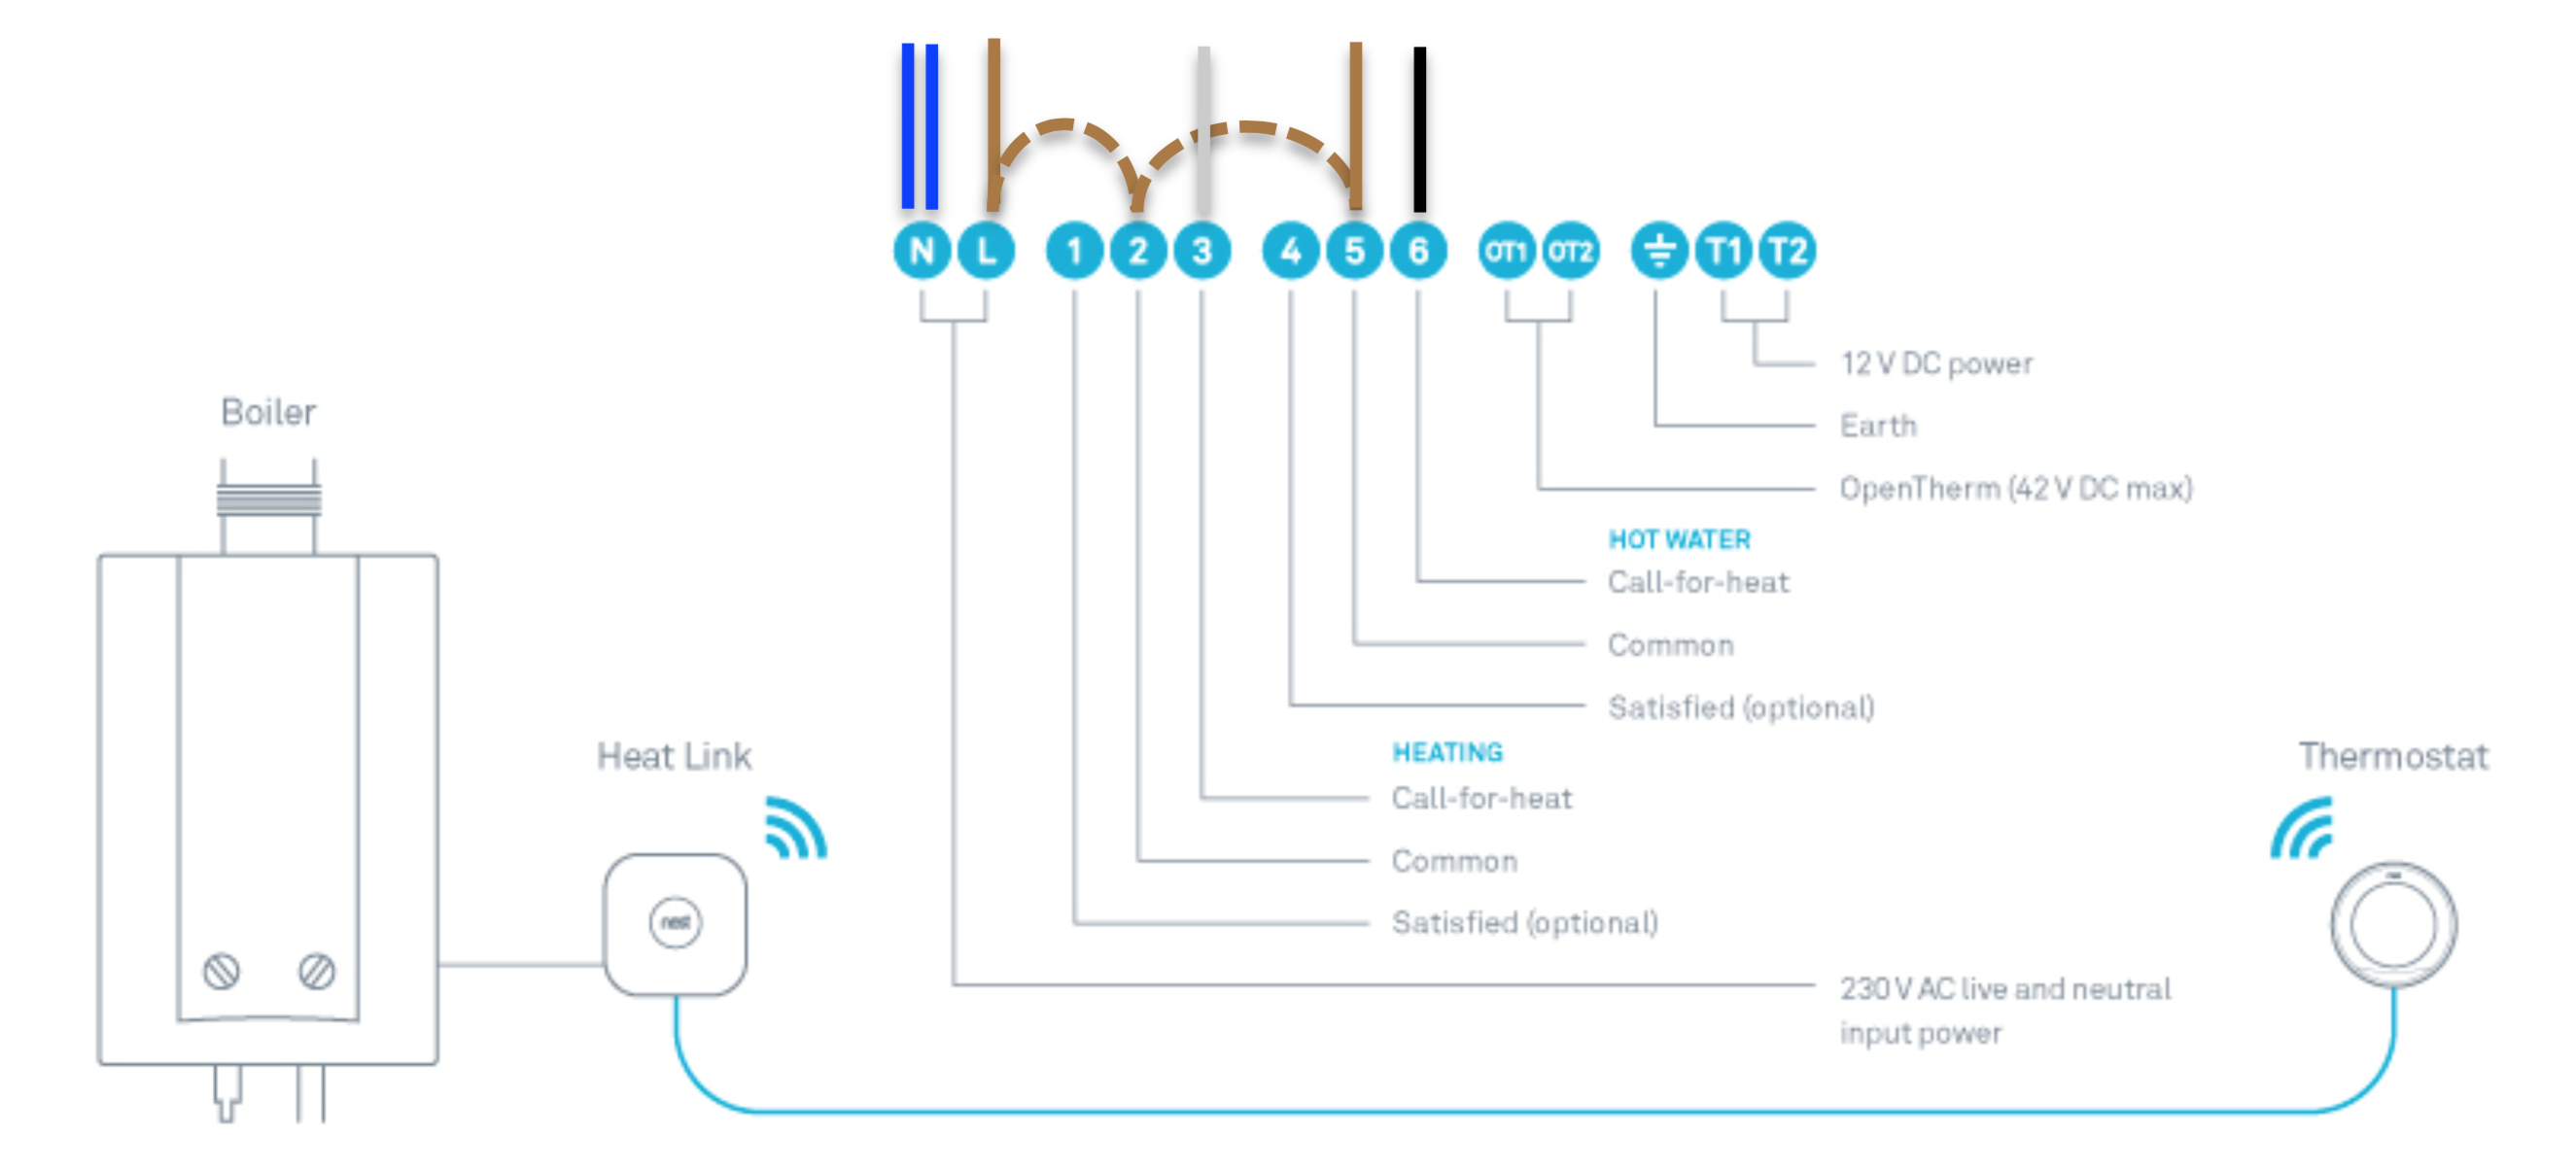 The Nest Wiring Diagram - Wiring Diagram Data Oreo - Nest Wiring Diagram